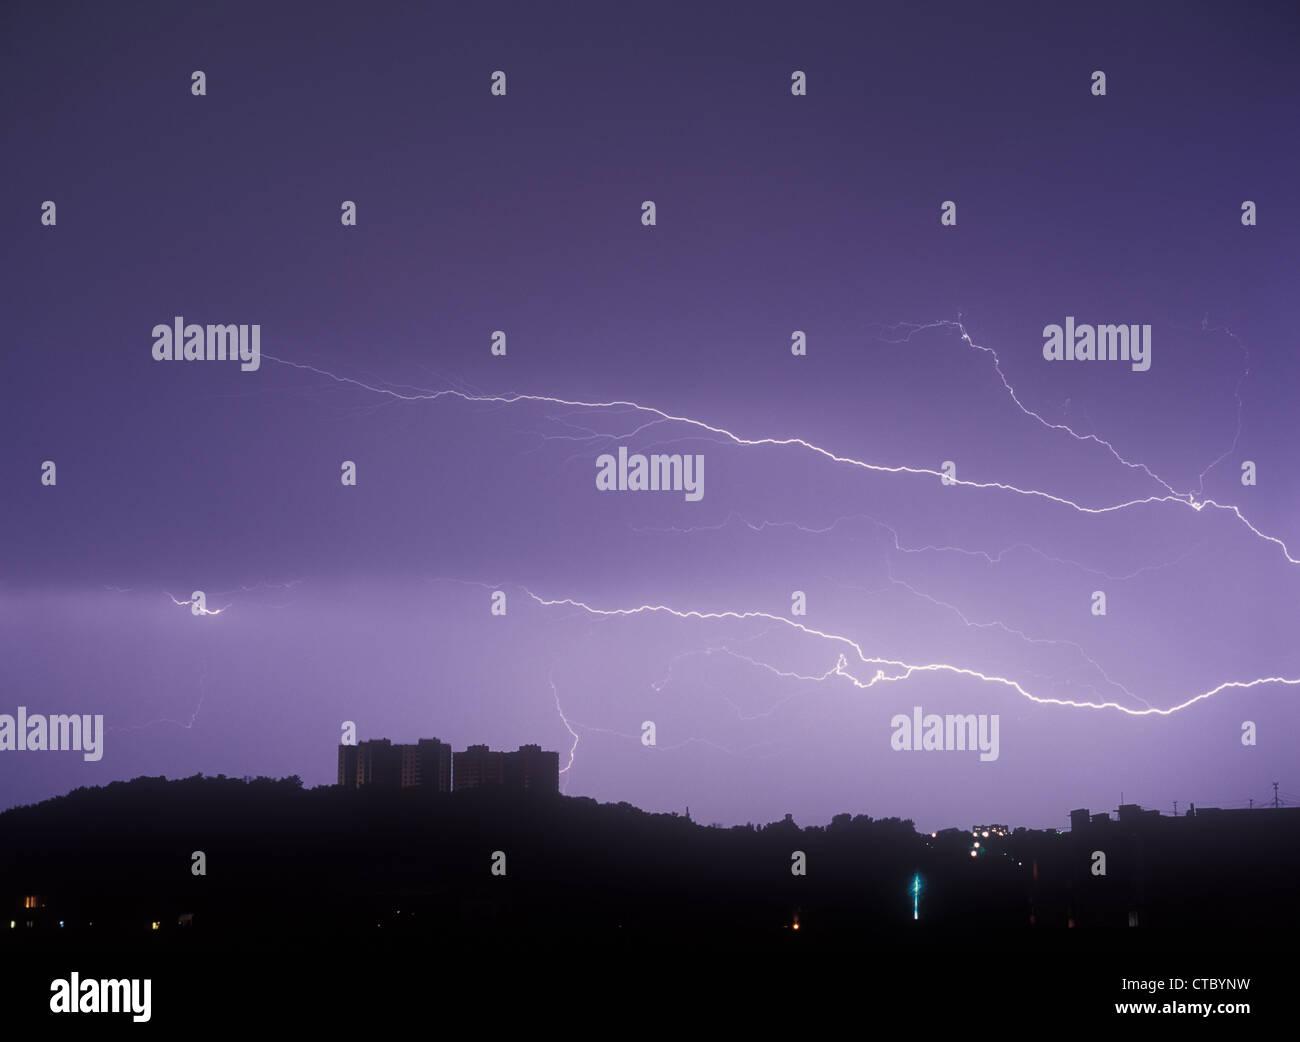 Lightning. - Stock Image